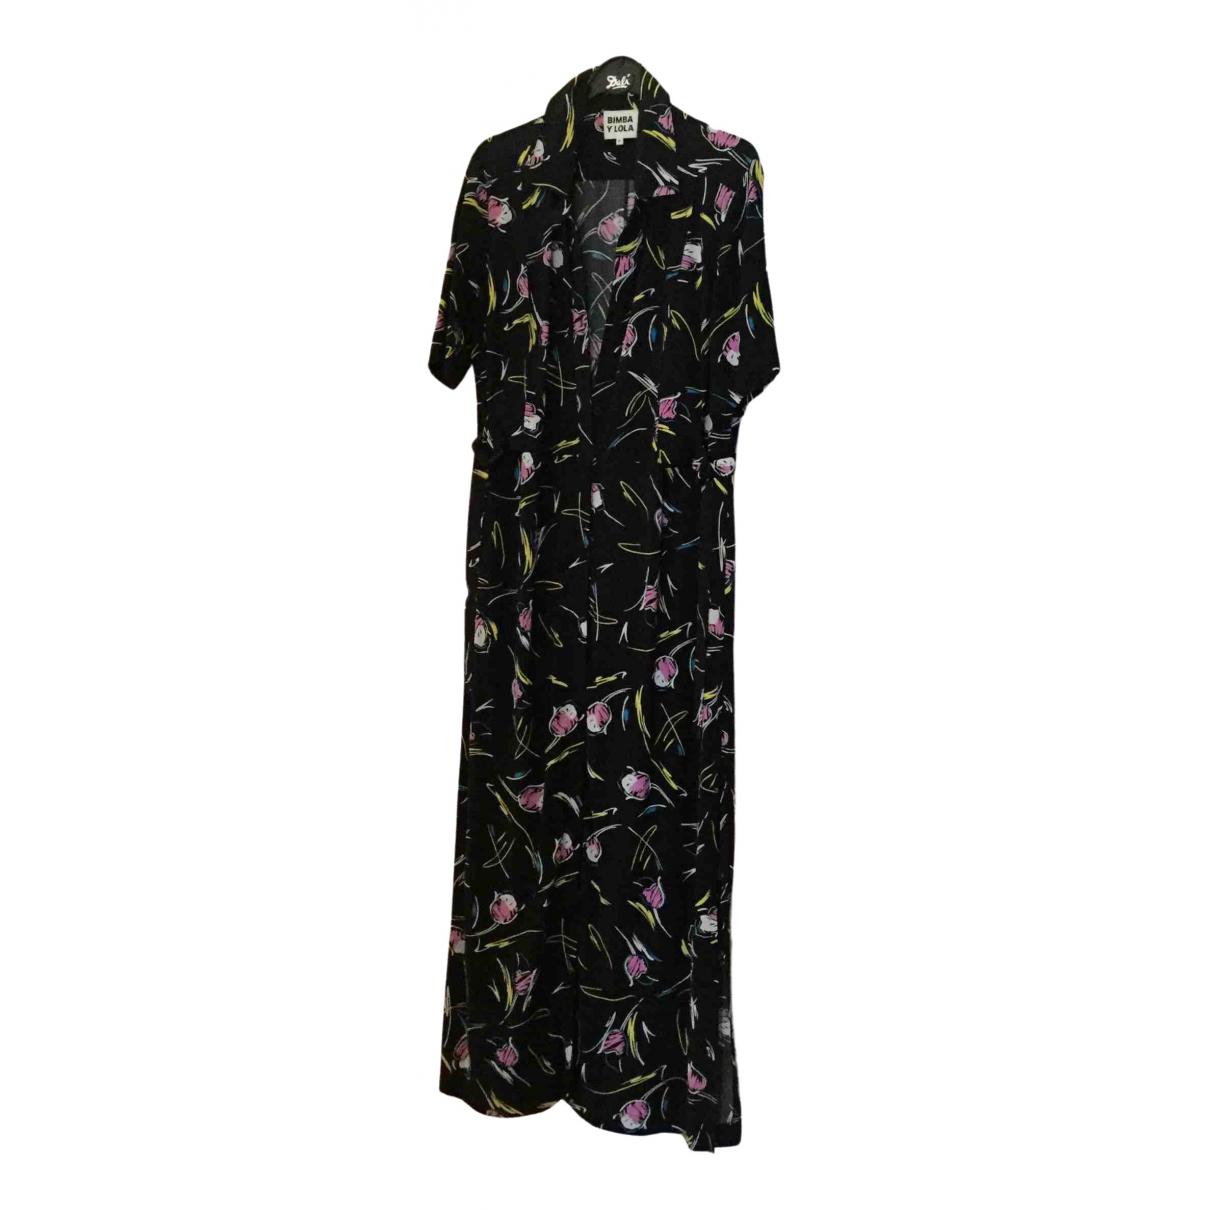 Bimba Y Lola \N Black dress for Women M International